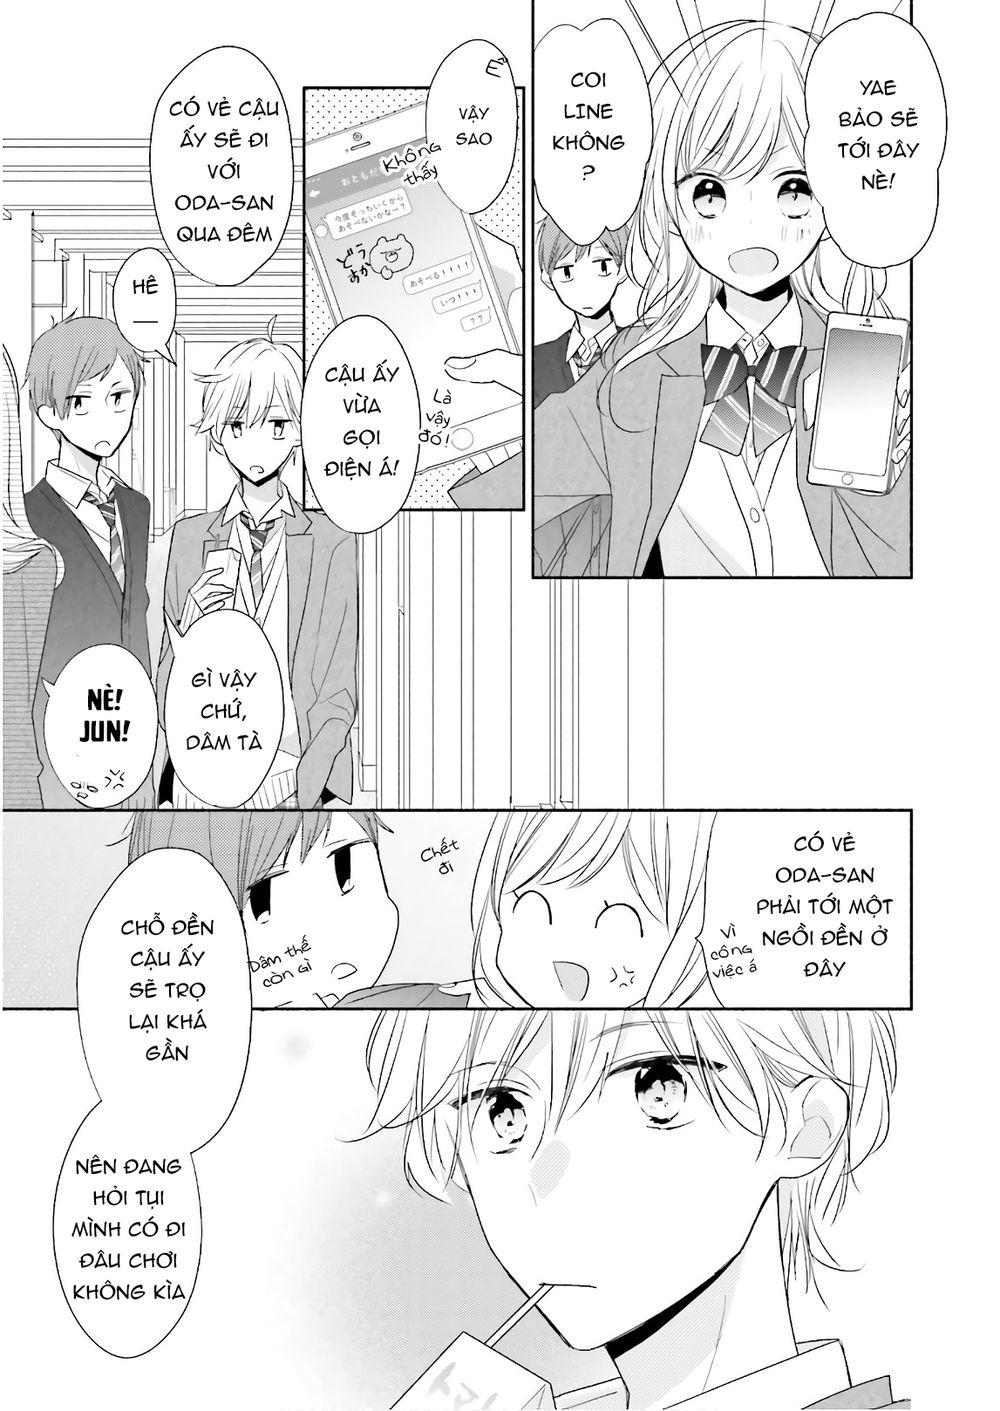 Tsugi wa Sasetene: Chapter 18